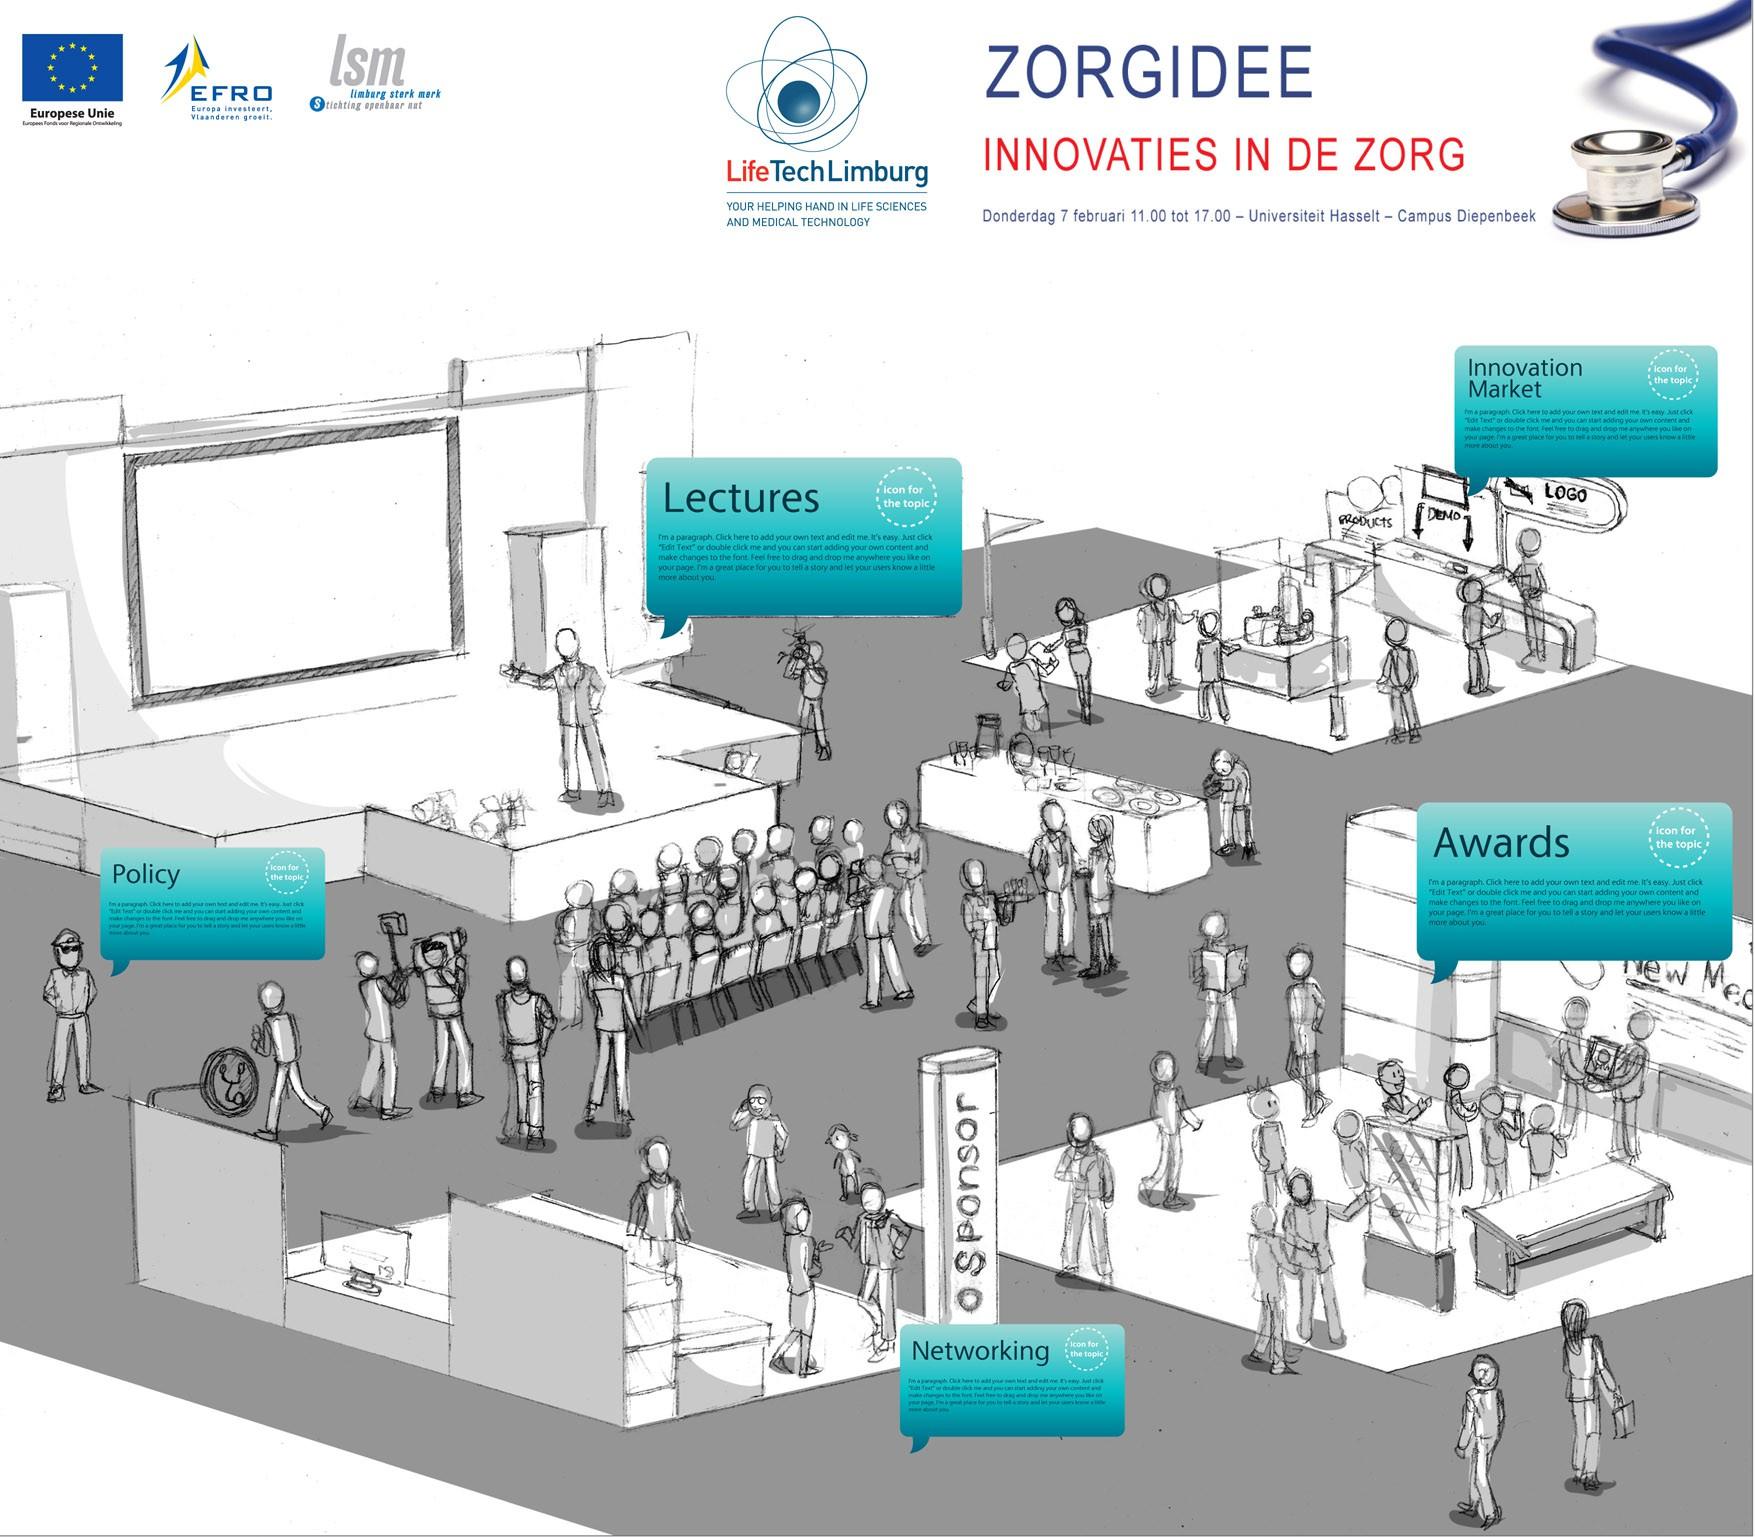 Infographic for LifeTech Limburg